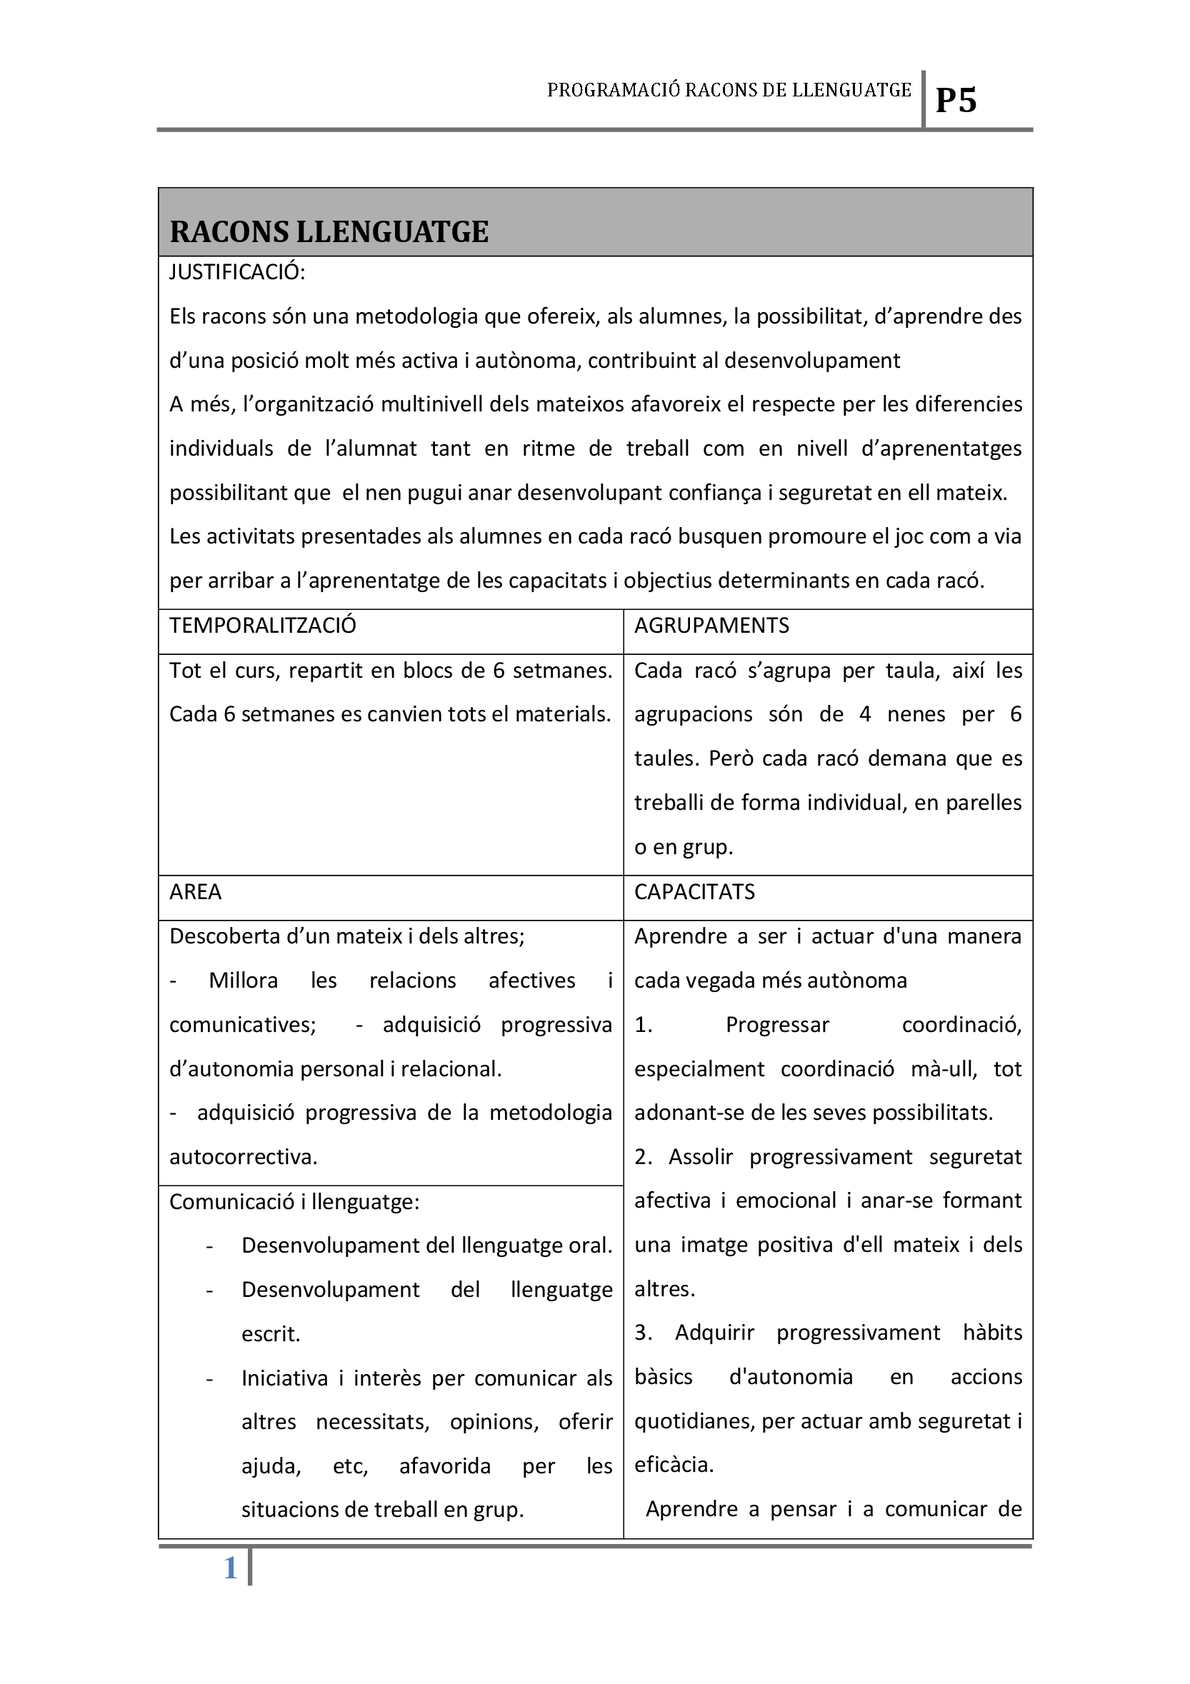 Programacio racons de llengua